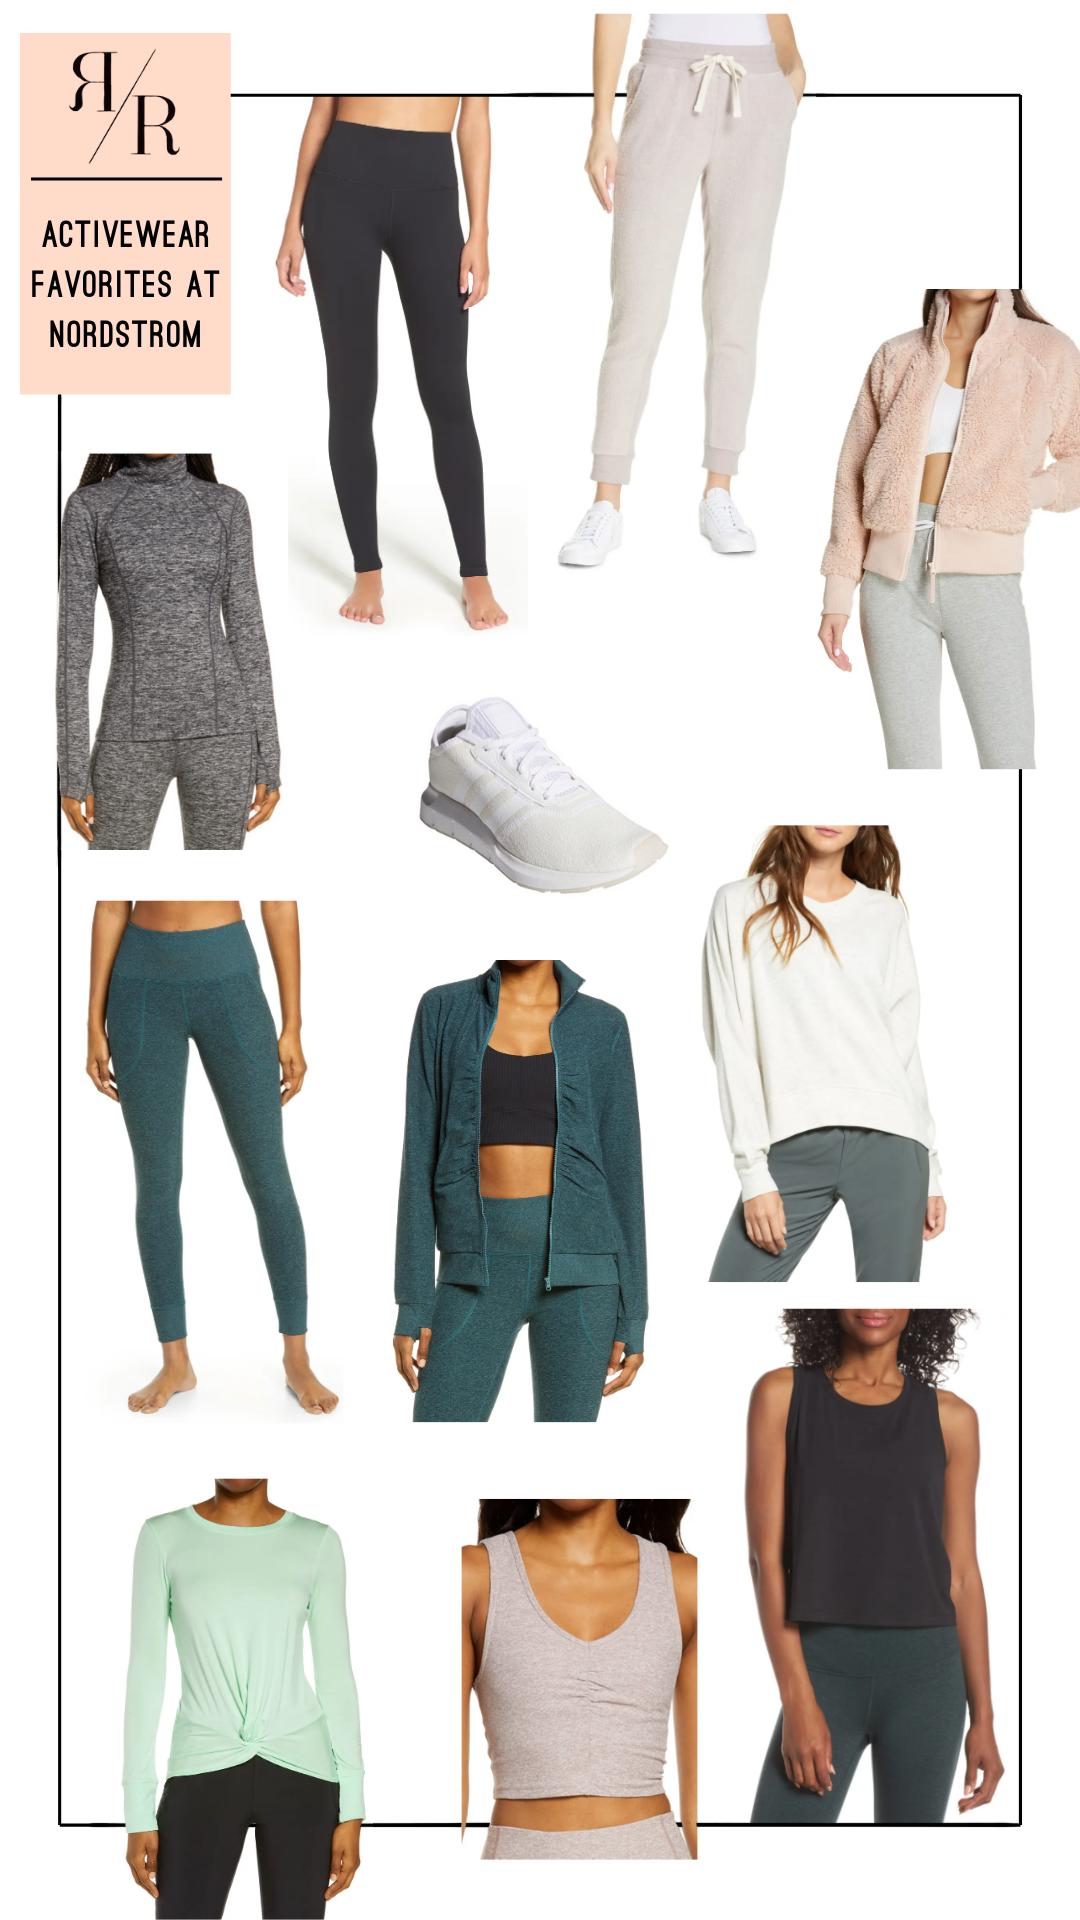 Ruthie Ridley Blog Activewear Favorites At Nordstrom